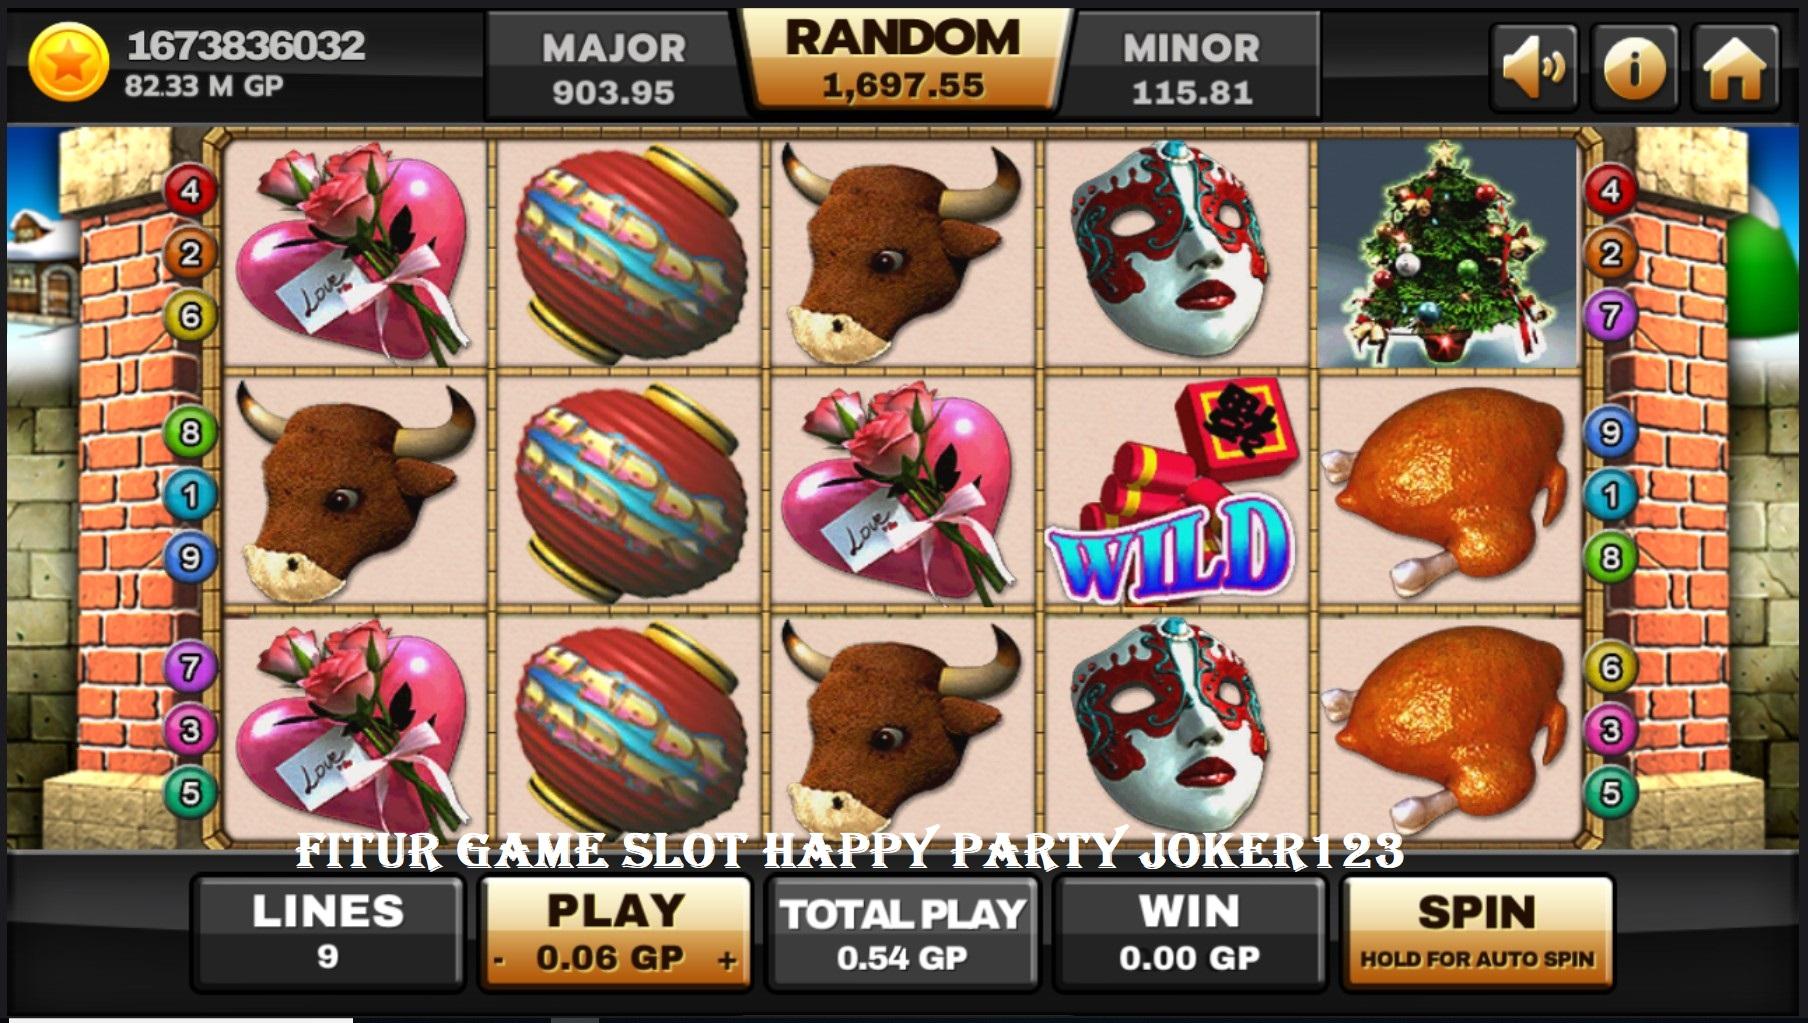 Fitur Game Slot Happy Party Joker123